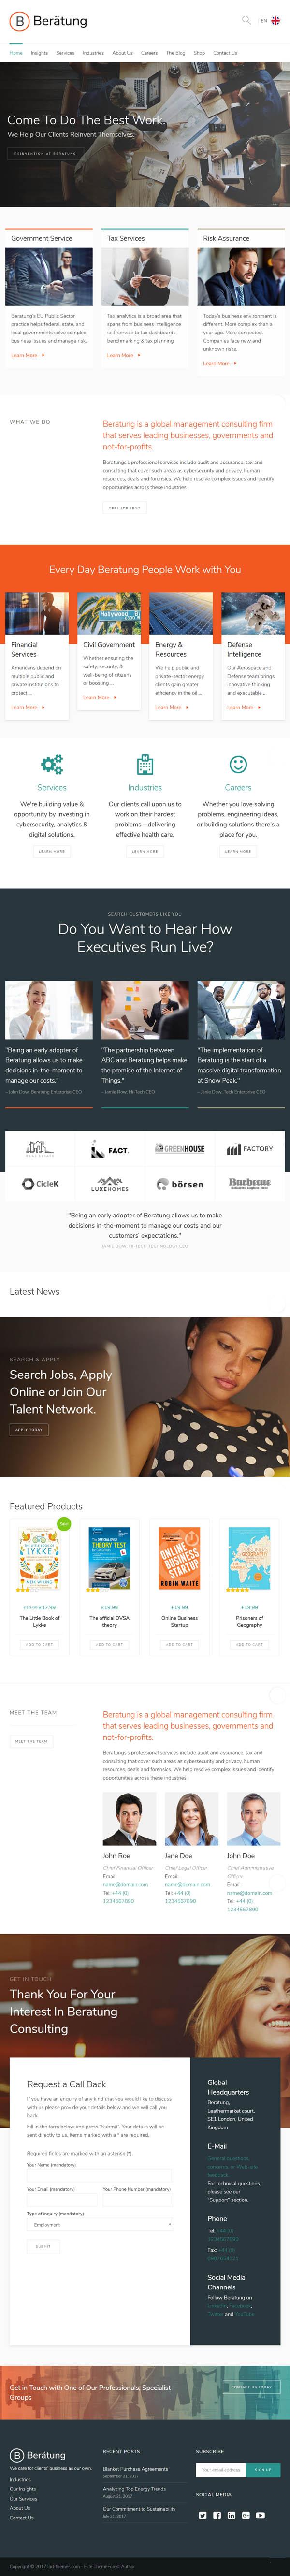 Beratung - Multi-Purpose Business & Consulting WordPress Theme